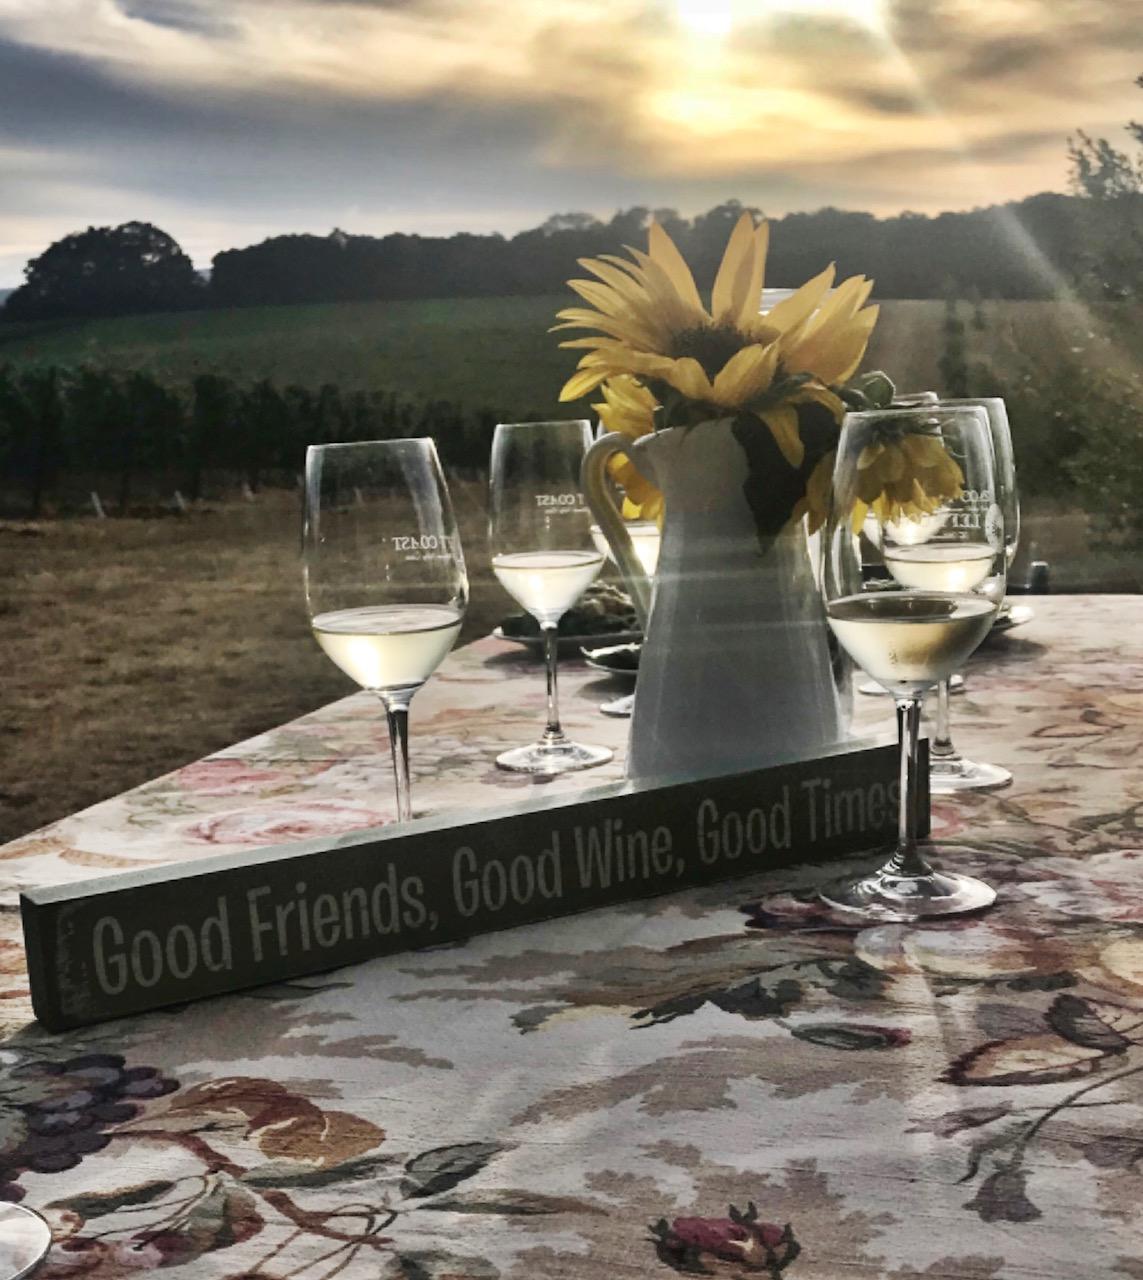 Good Friends, Good Wine.jpg